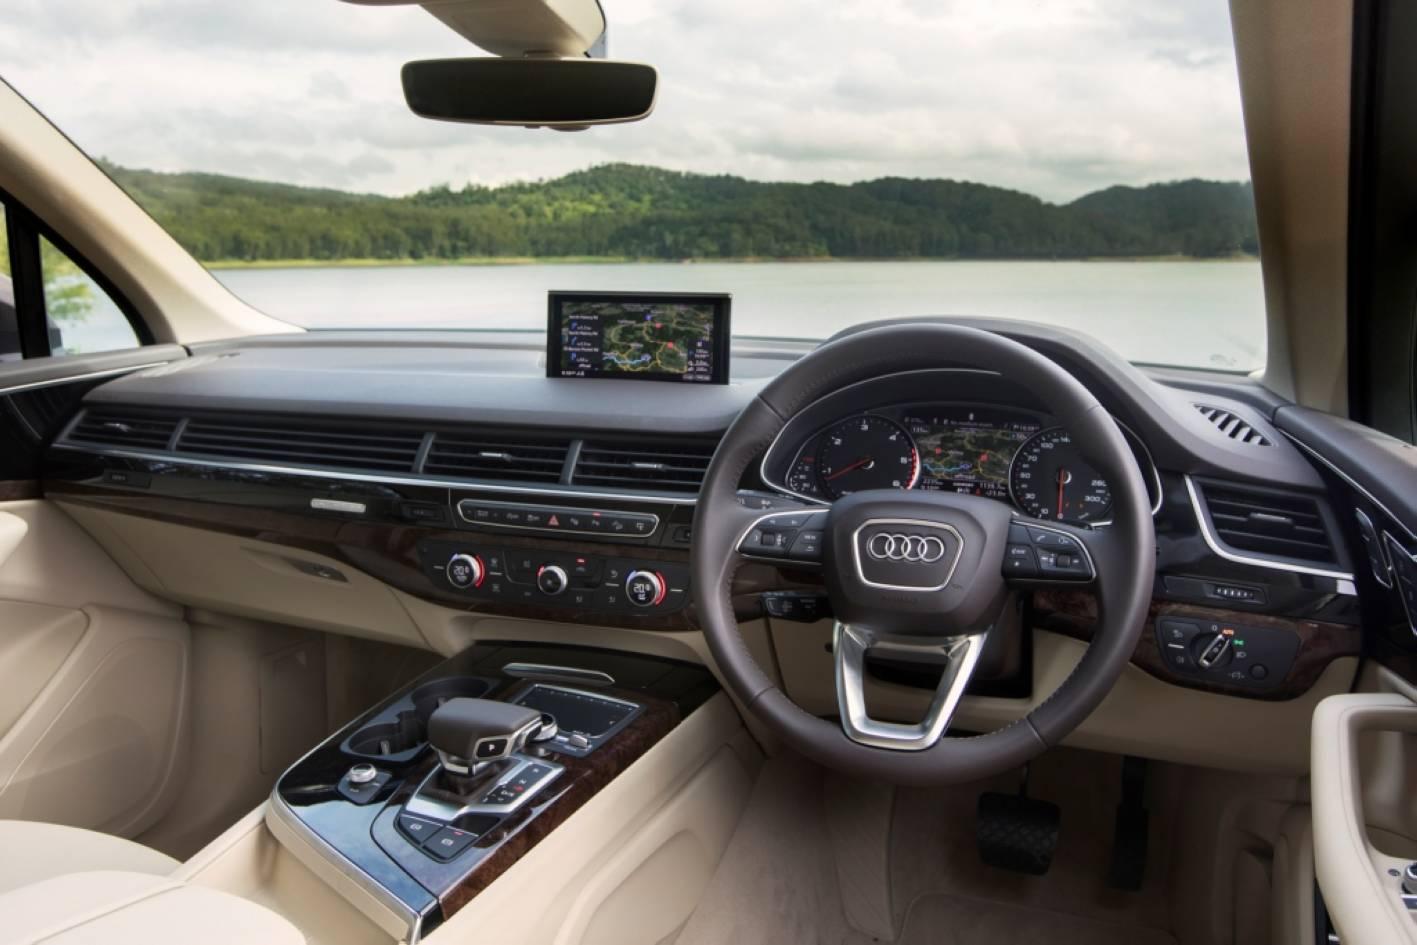 Audi Introduces Cheaper Less Powerful 160kw Q7 In Australia